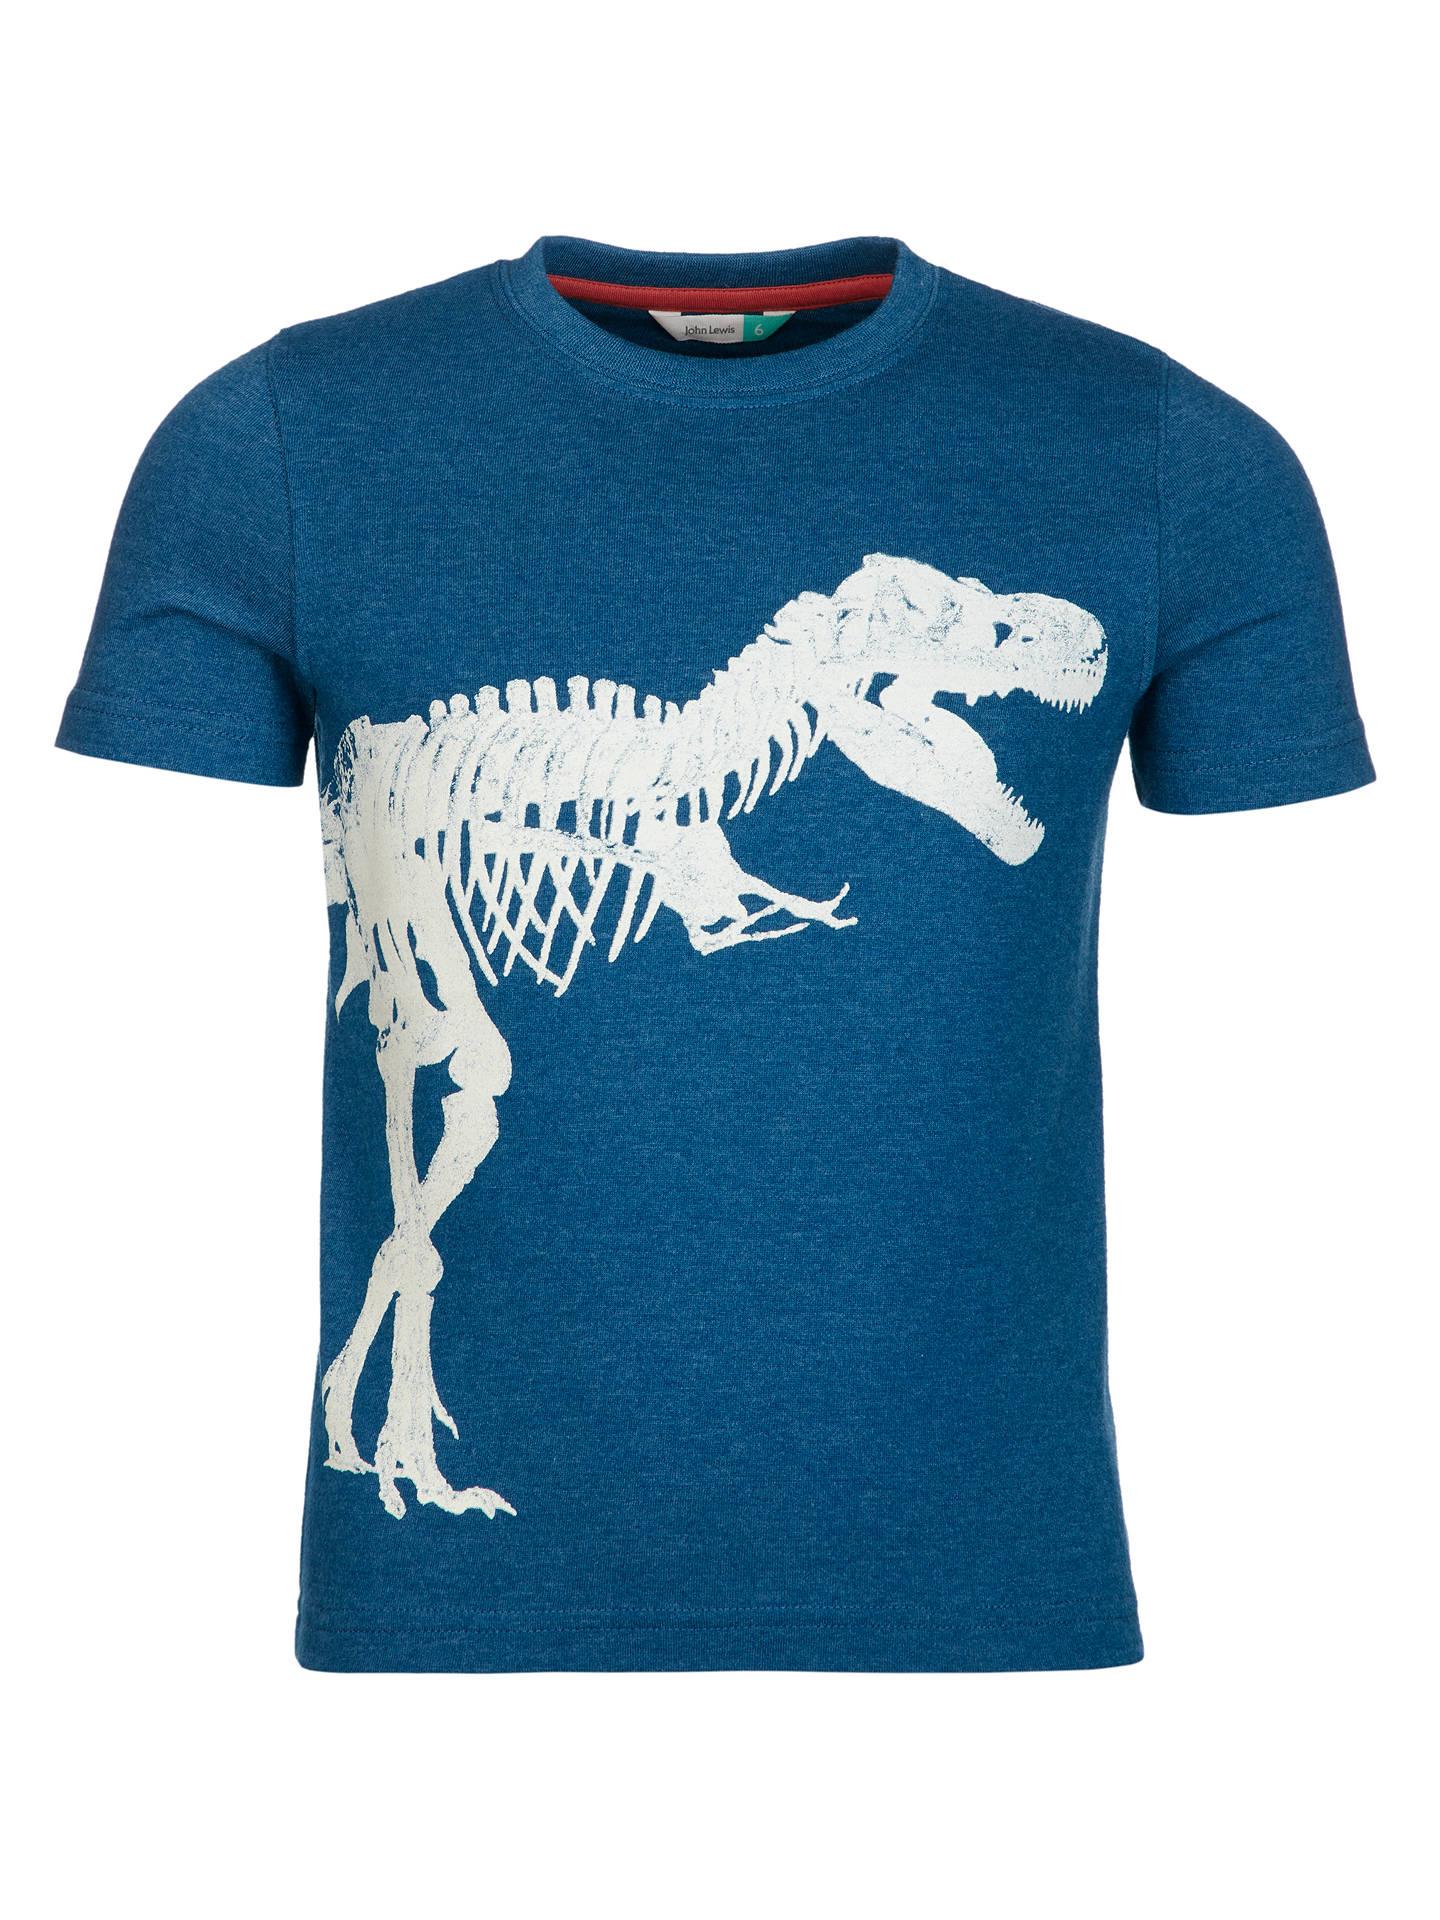 97e17a8d John Lewis Boys' Dinosaur T-Rex Graphic Glow In The Dark T-Shirt ...